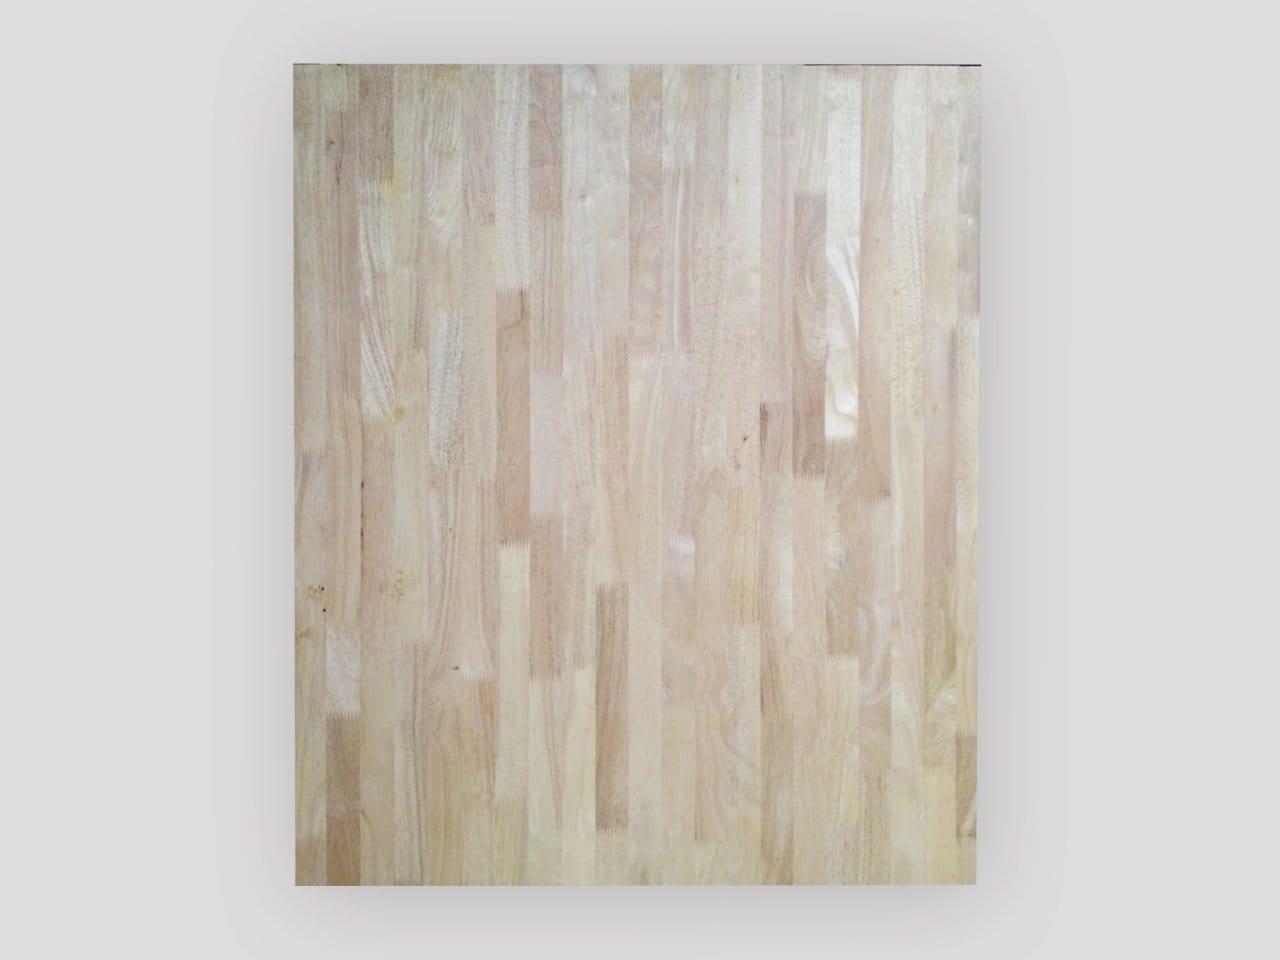 Clean Rubberwood Comfort Design Furniture